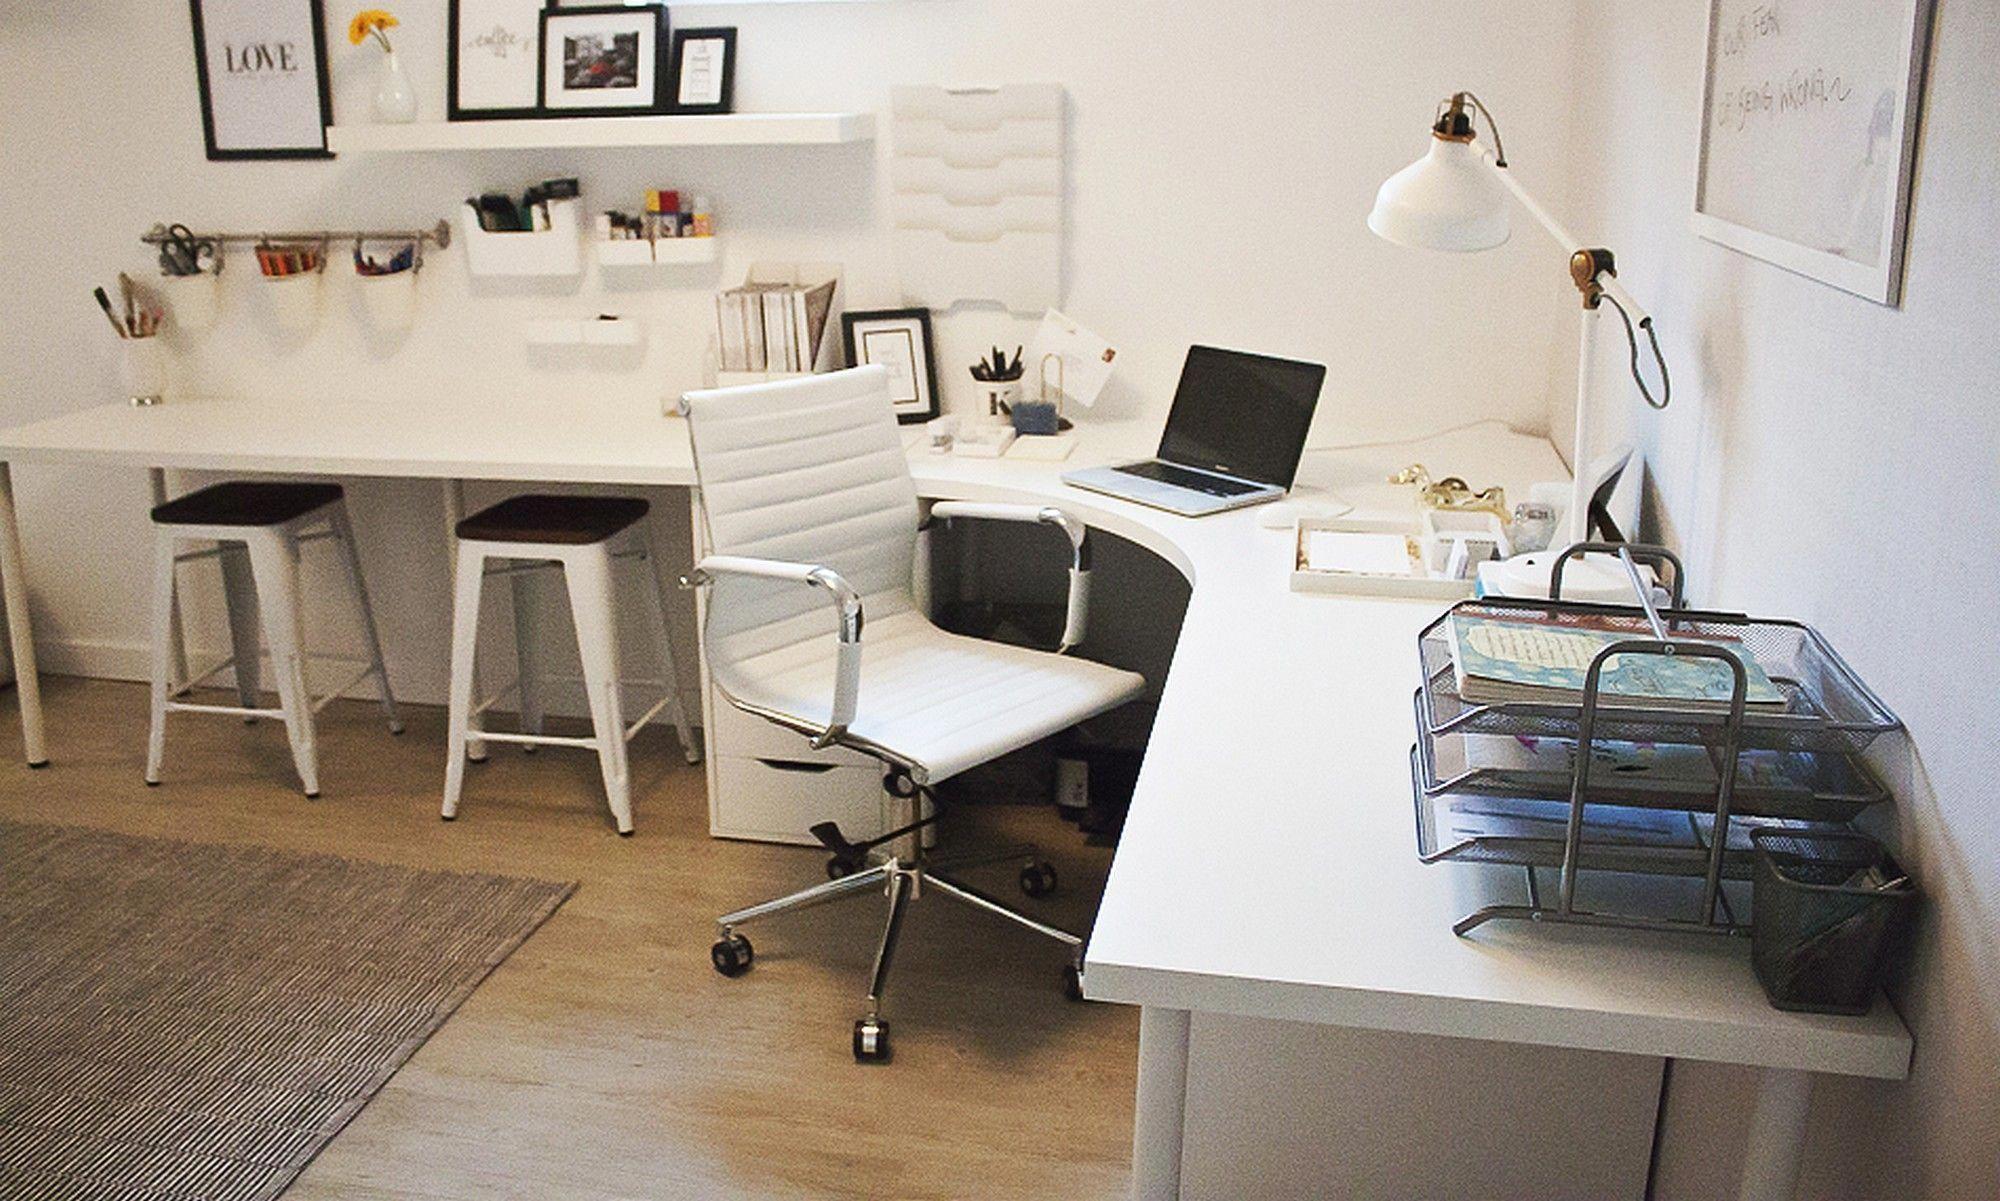 Home Office Corner Desk Setup Ikea Linnmon Adils Combination Homeofficeideas Officedesk Home Office Design Ikea Home Office Corner Desk Office